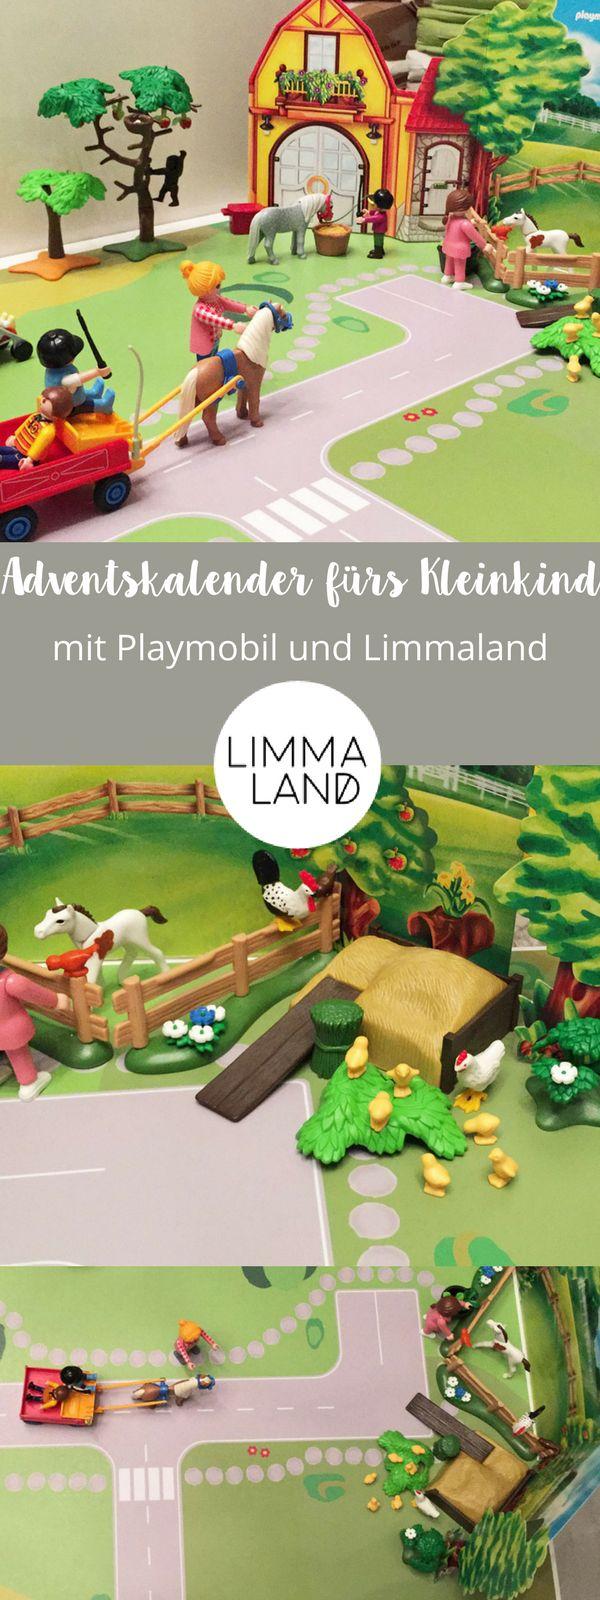 Die besten 25+ Playmobil figuren Ideen auf Pinterest | Playmobil ...